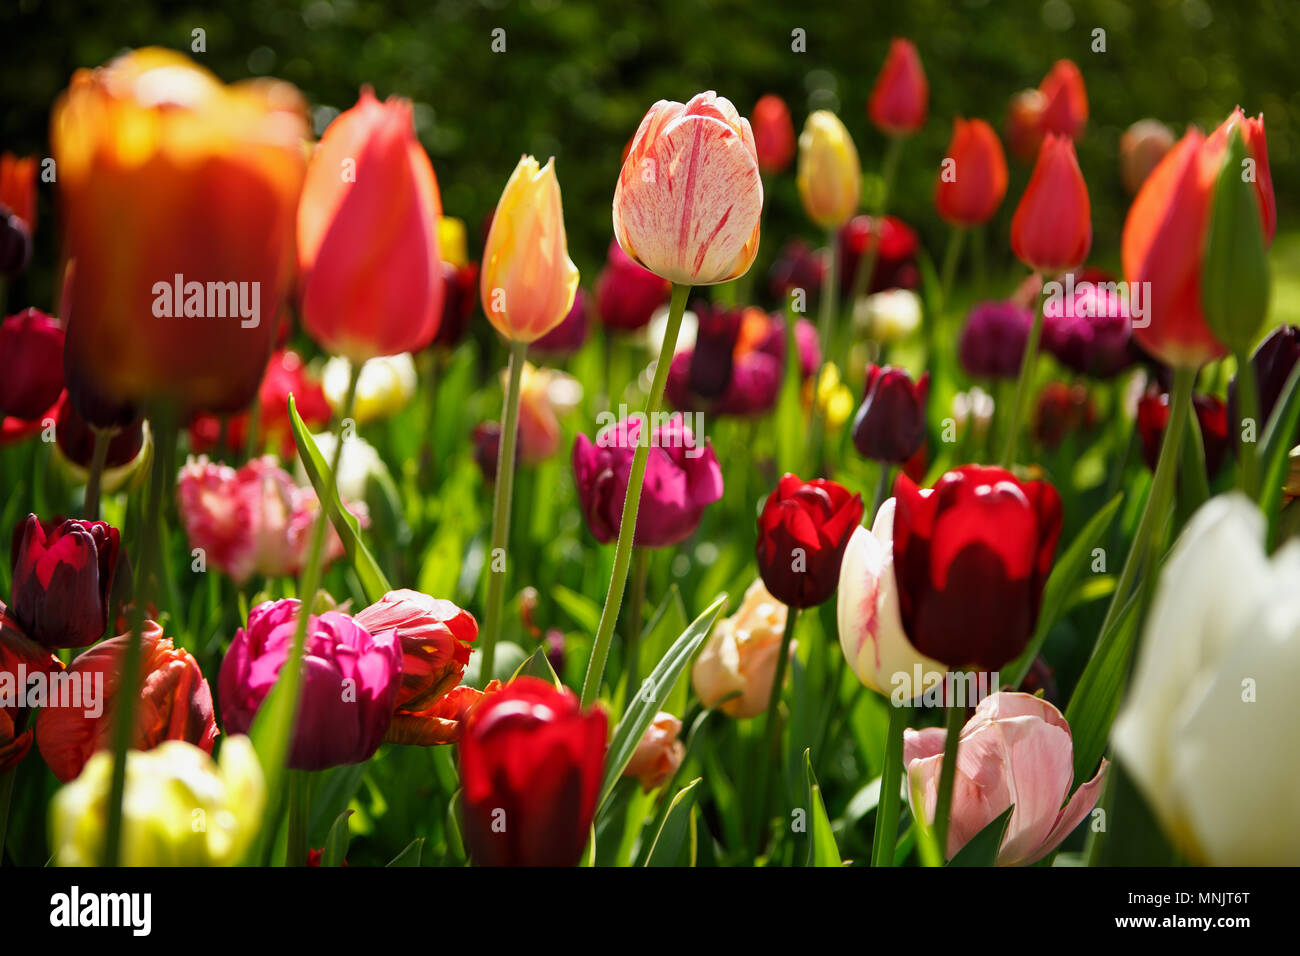 Beautiful Colorful Tulip Flowers Bloom In Spring Gardencorative